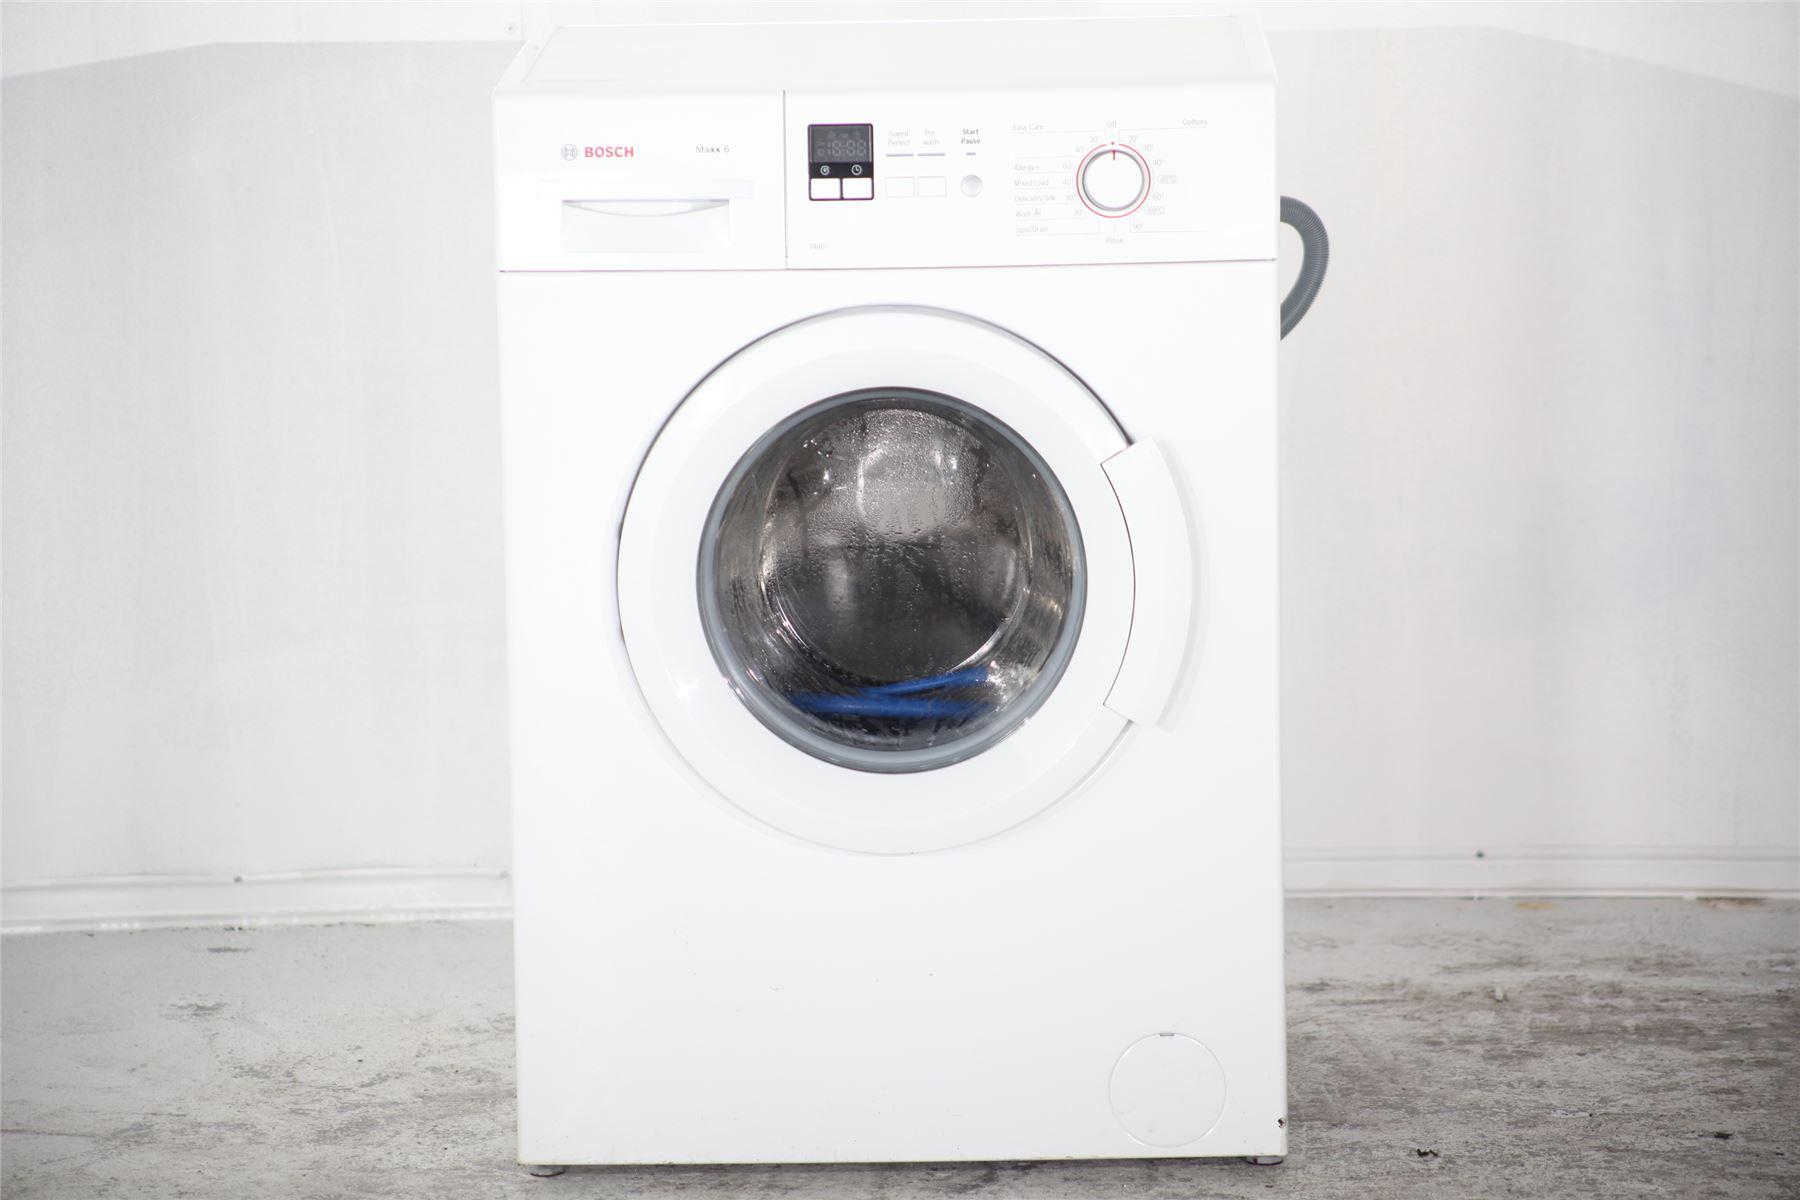 537661 bosch maxx 6kg washing machine wab28161gb. Black Bedroom Furniture Sets. Home Design Ideas